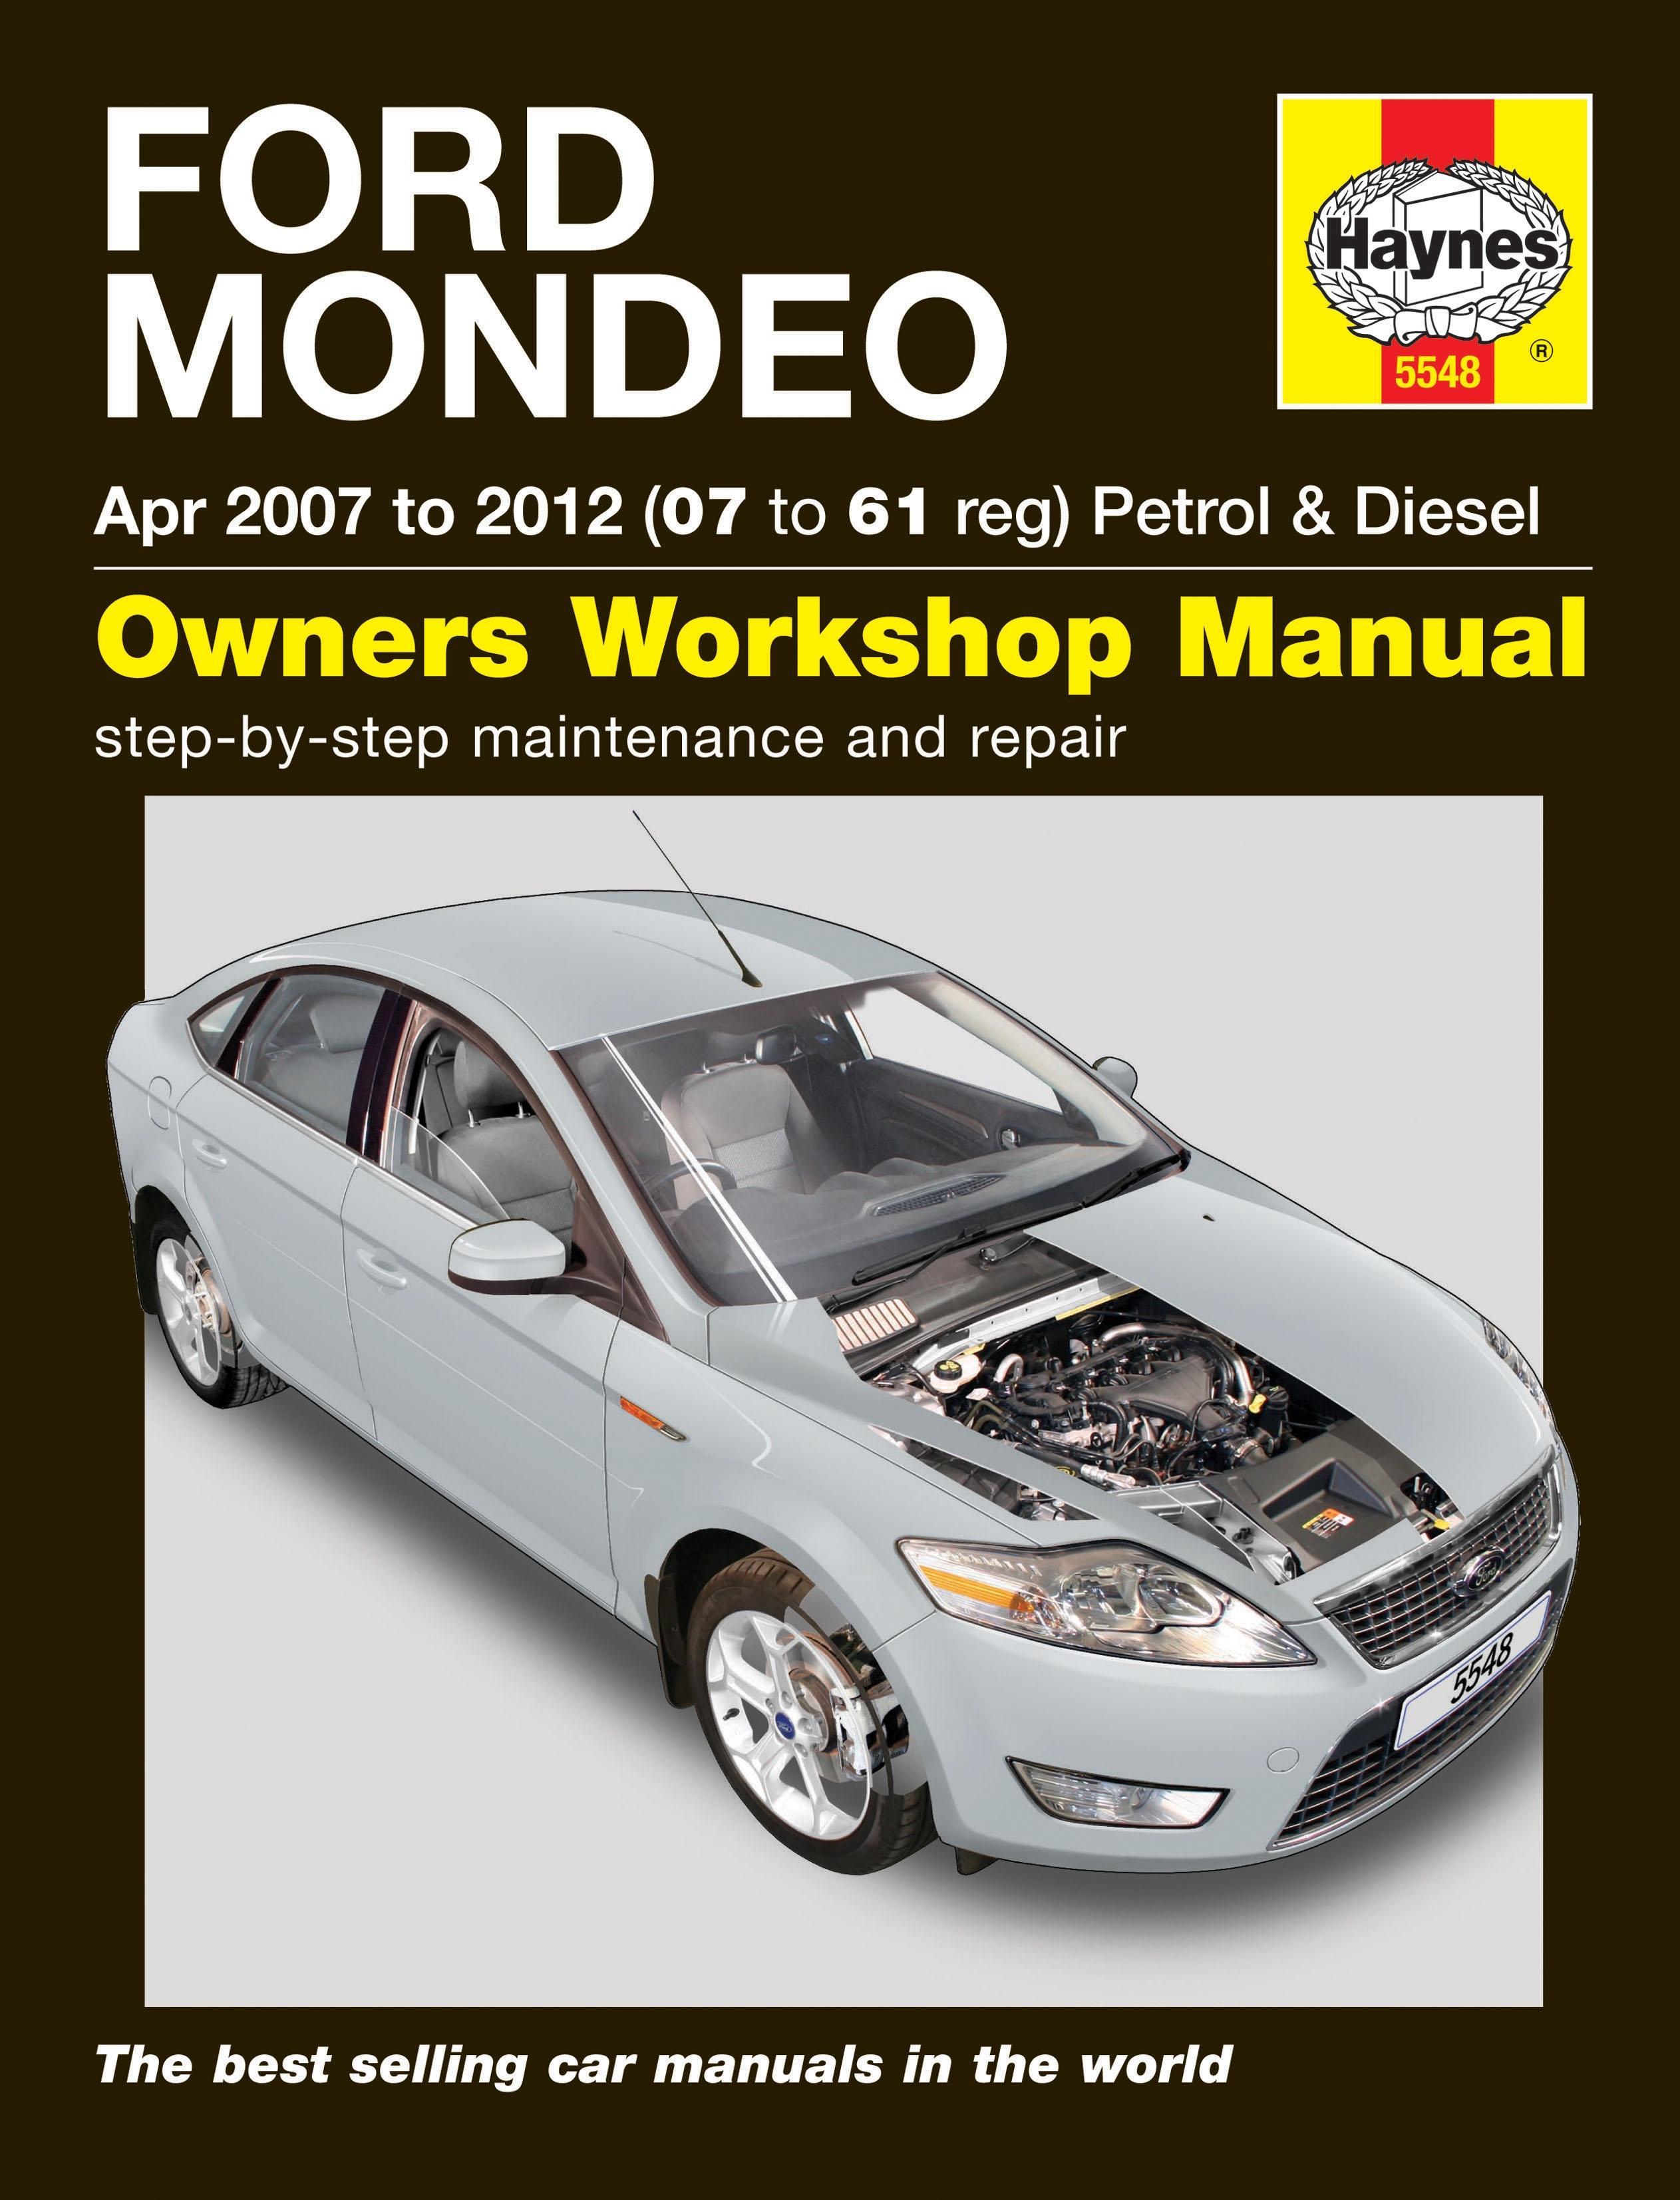 haynes owners workshop manual ford mondeo 2007 2012 petrol diesel maintenance ebay. Black Bedroom Furniture Sets. Home Design Ideas